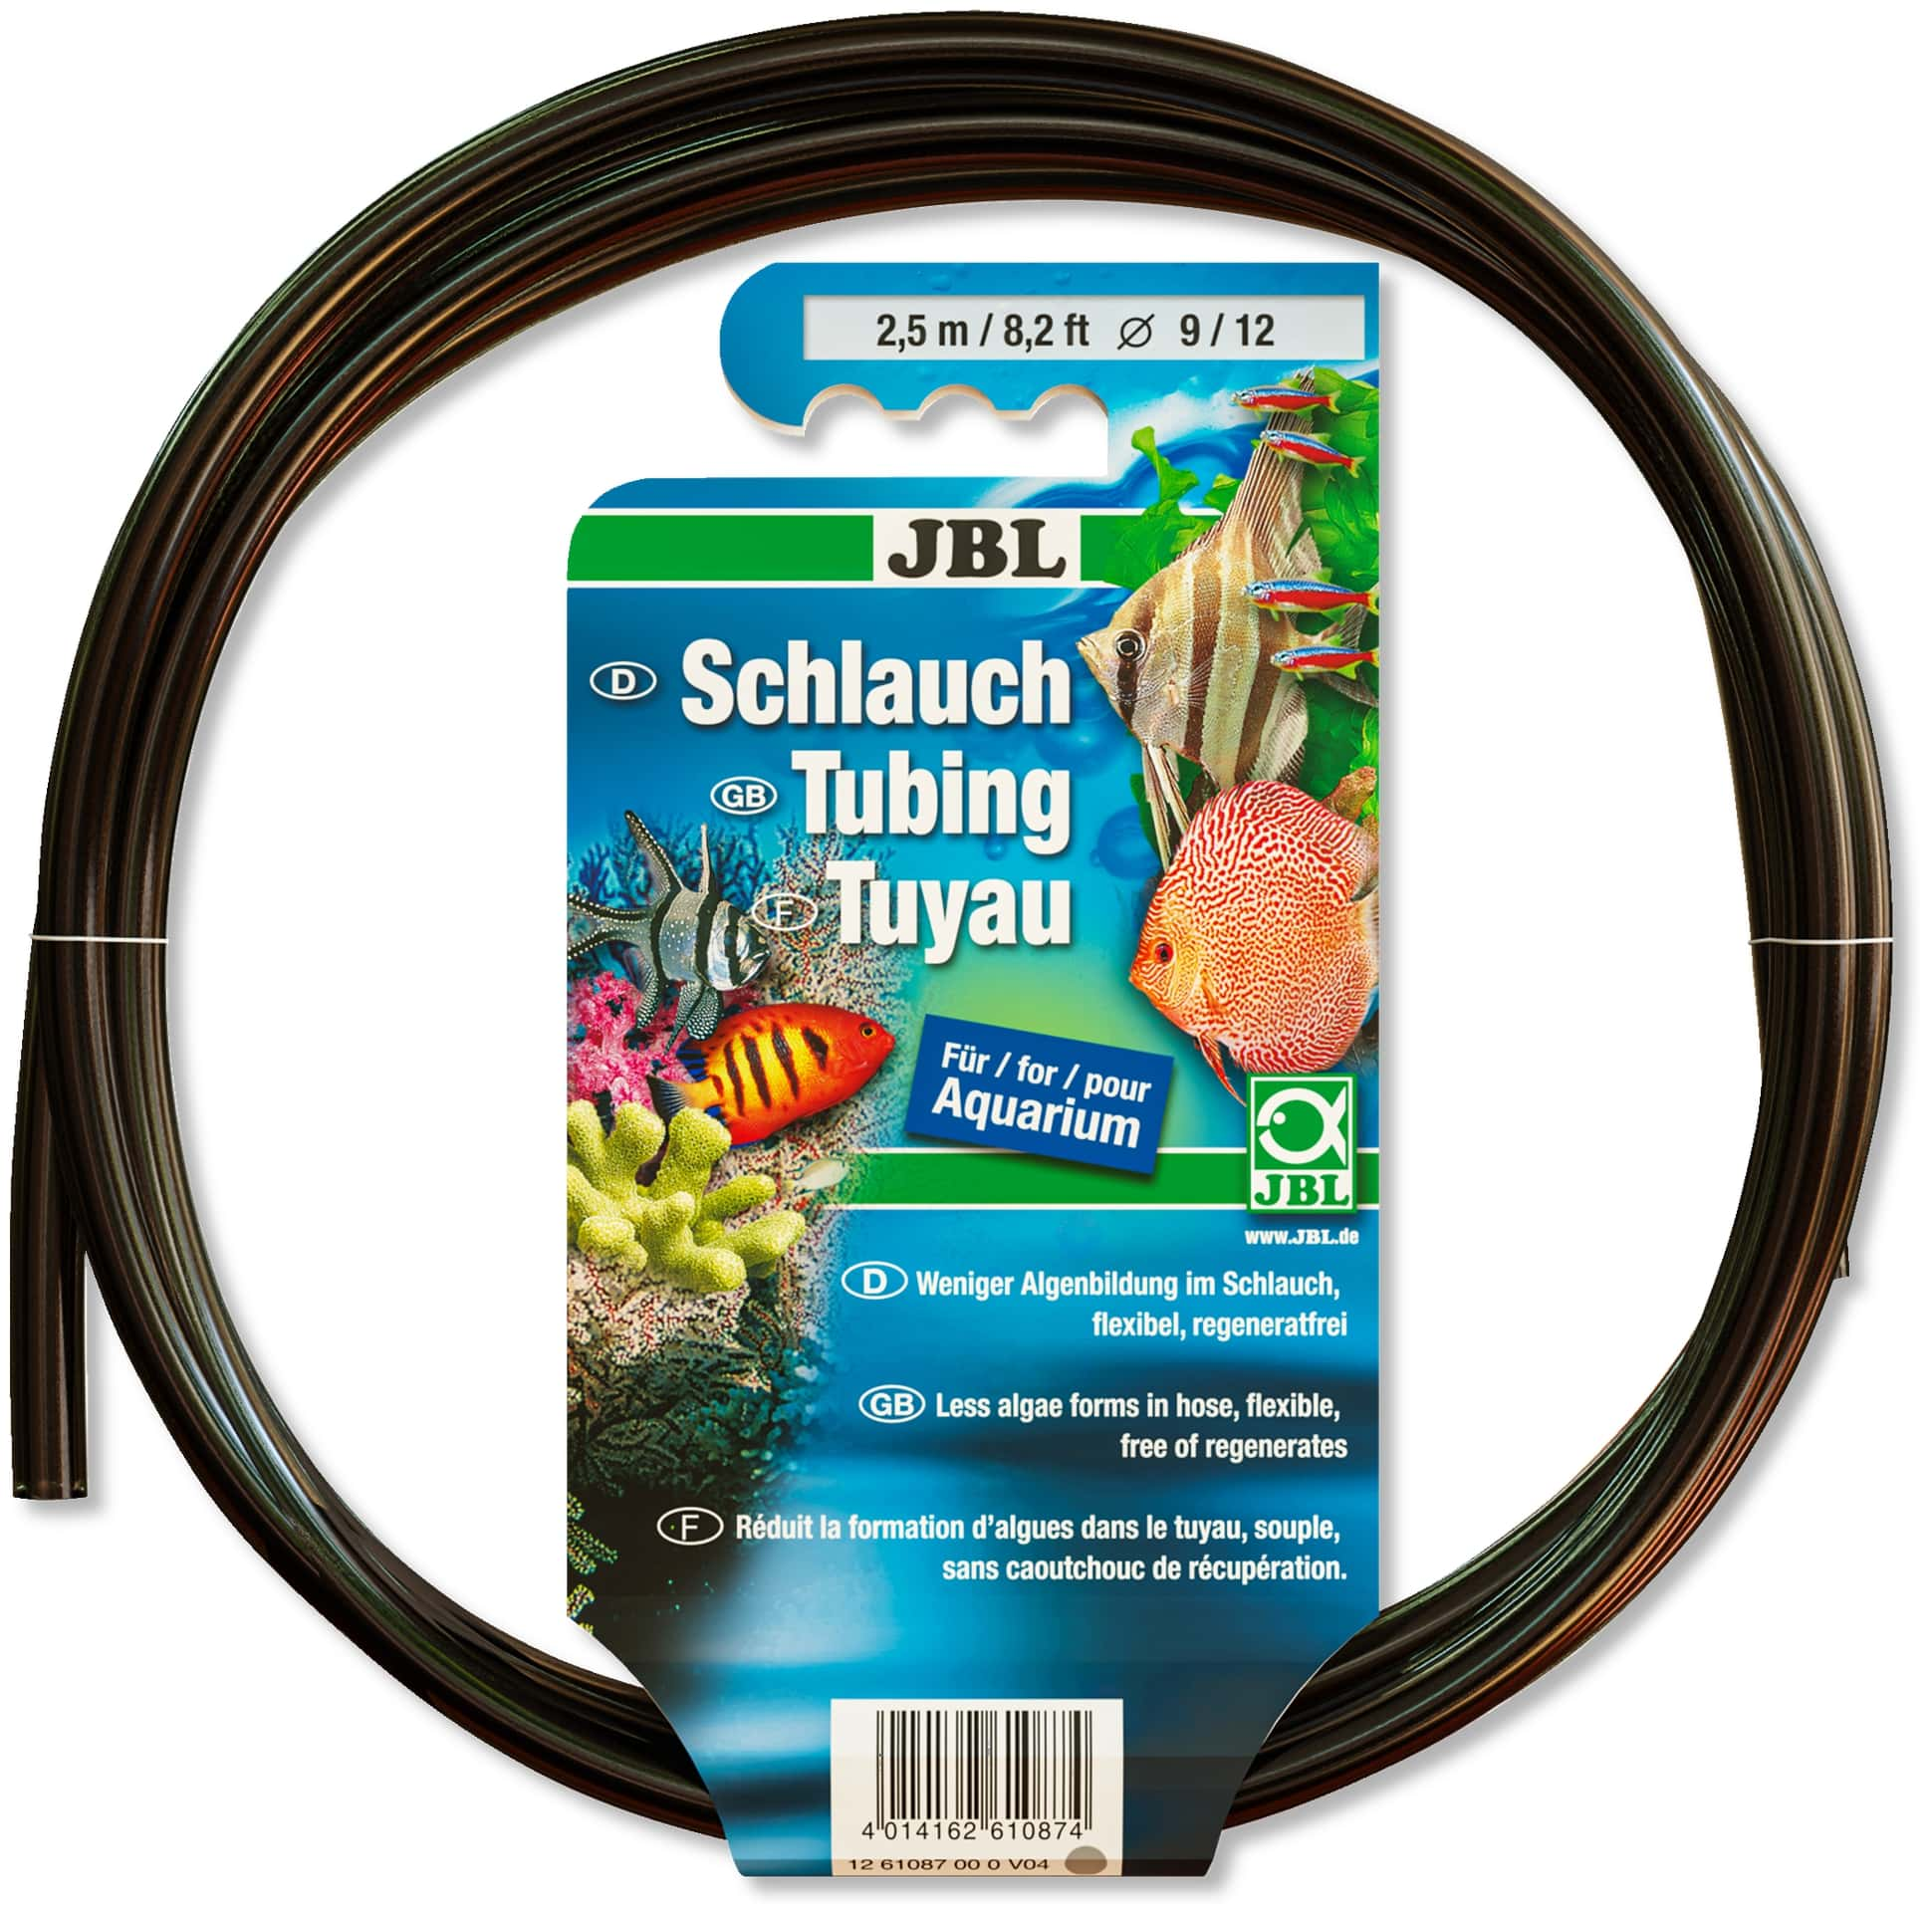 JBL- Tuyau gris-transparent 9/12 2,5m anti-algues